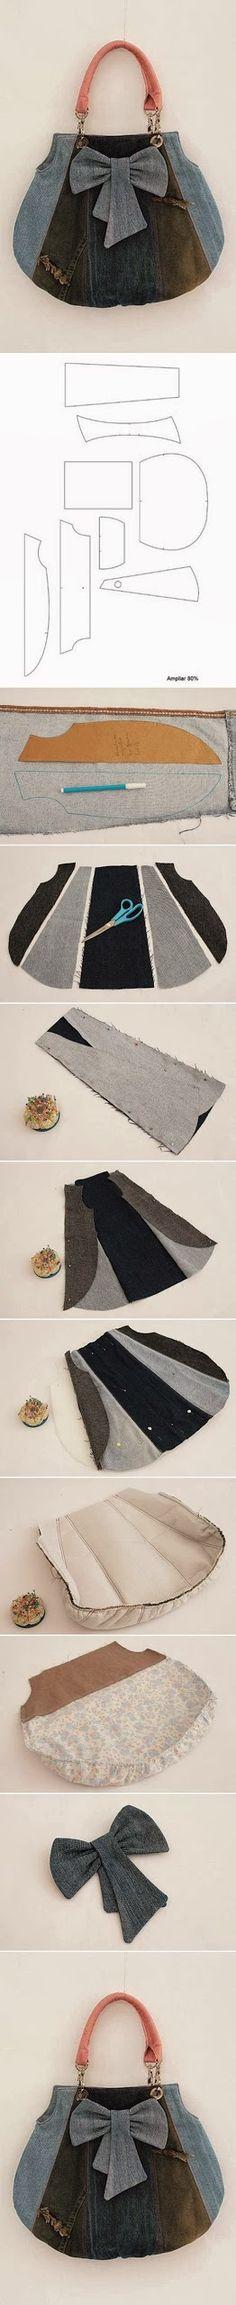 sac multi-pièces